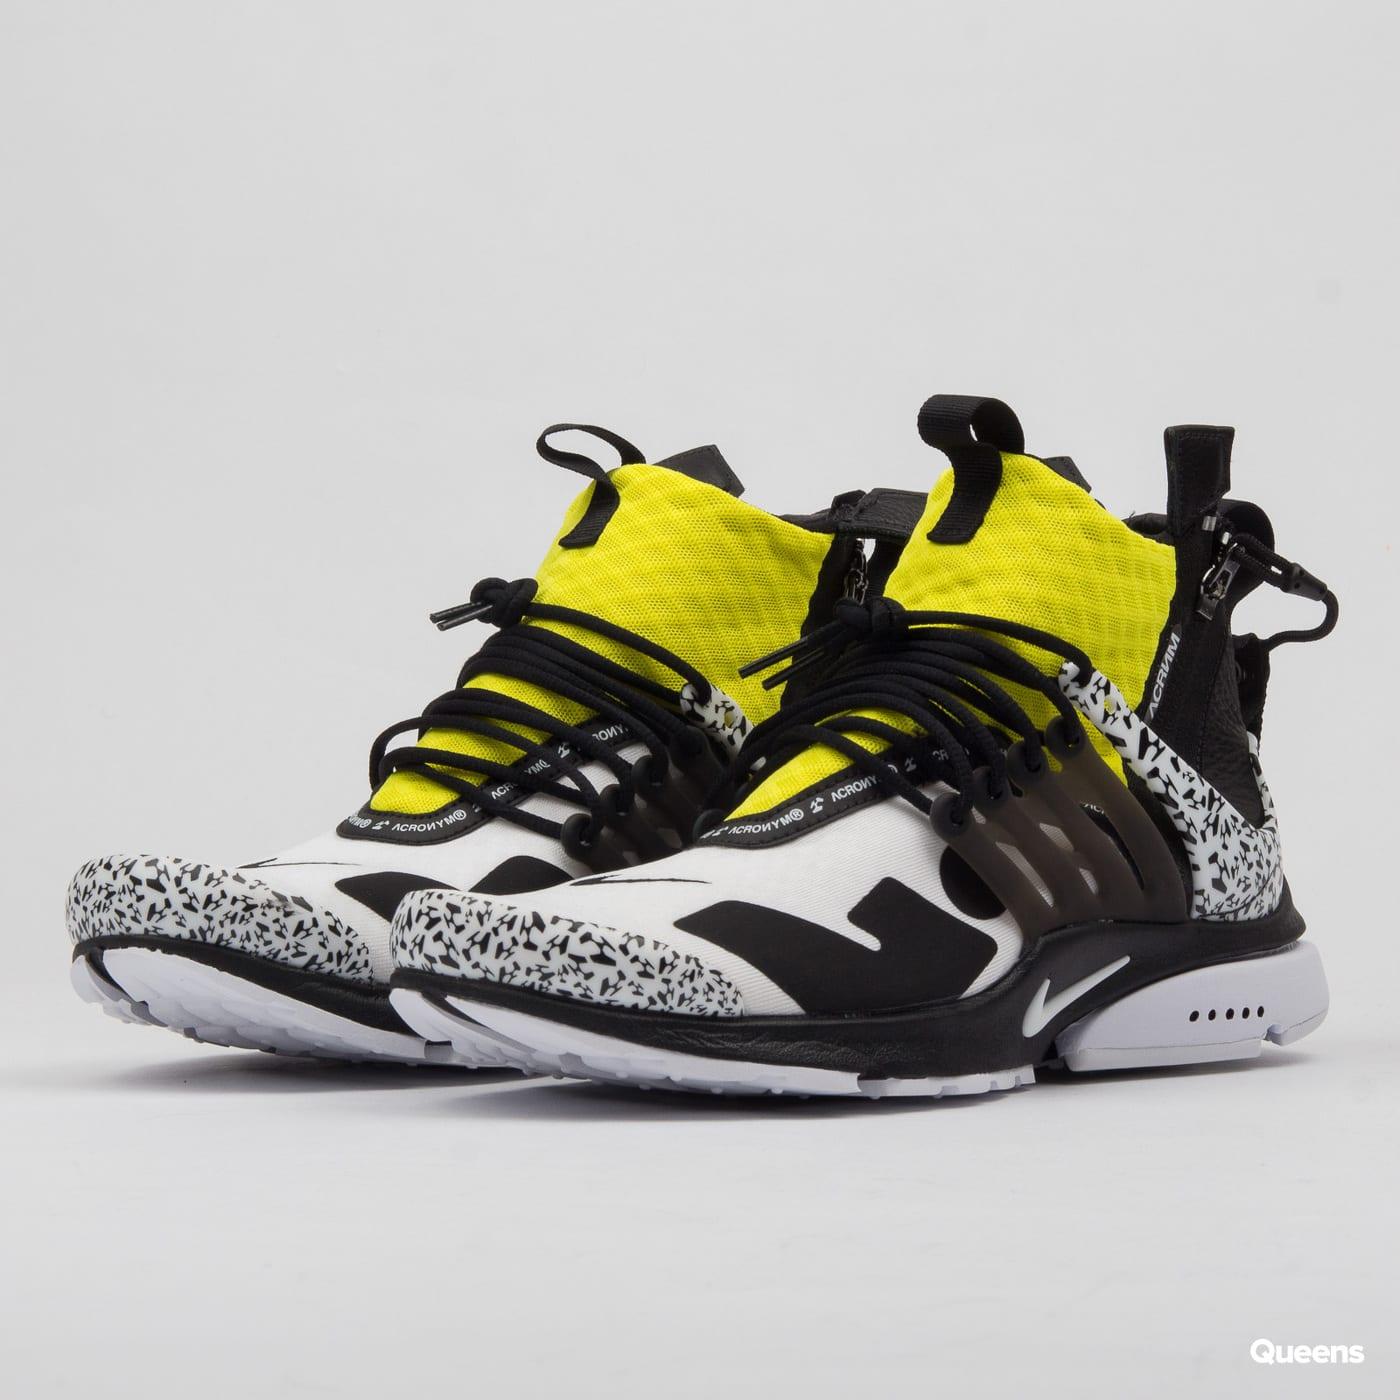 86995917356 Boty Nike Air Presto Mid   Acronym (AH7832-100) – Queens 💚